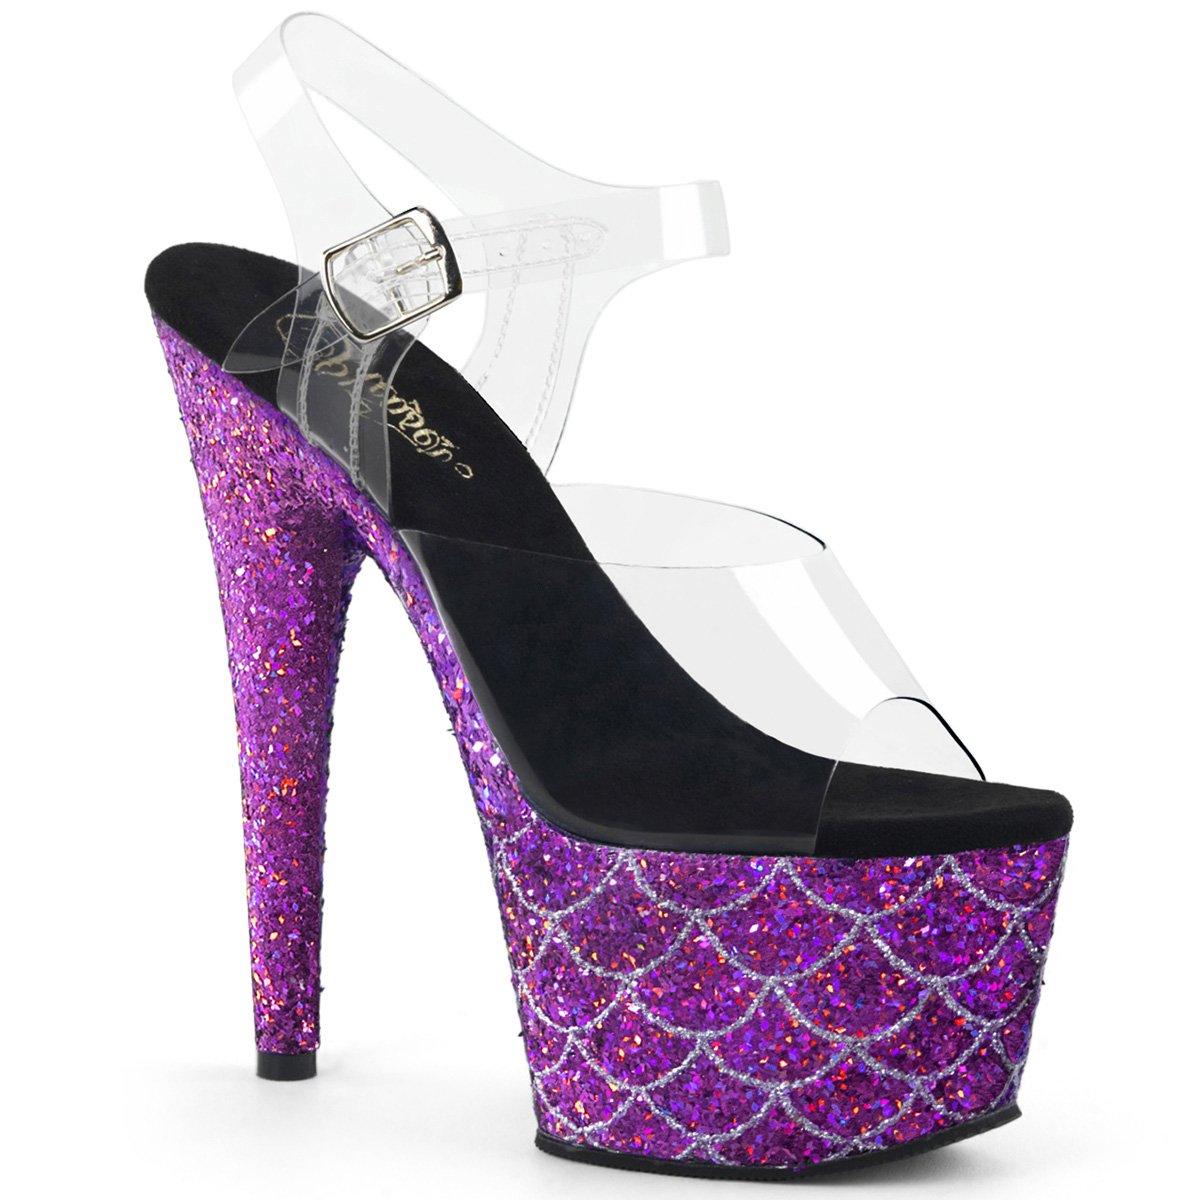 Women's Adore Purple Glitter Fish Scale Design Ankle-Strap Platform Sandals - DeluxeAdultCostumes.com